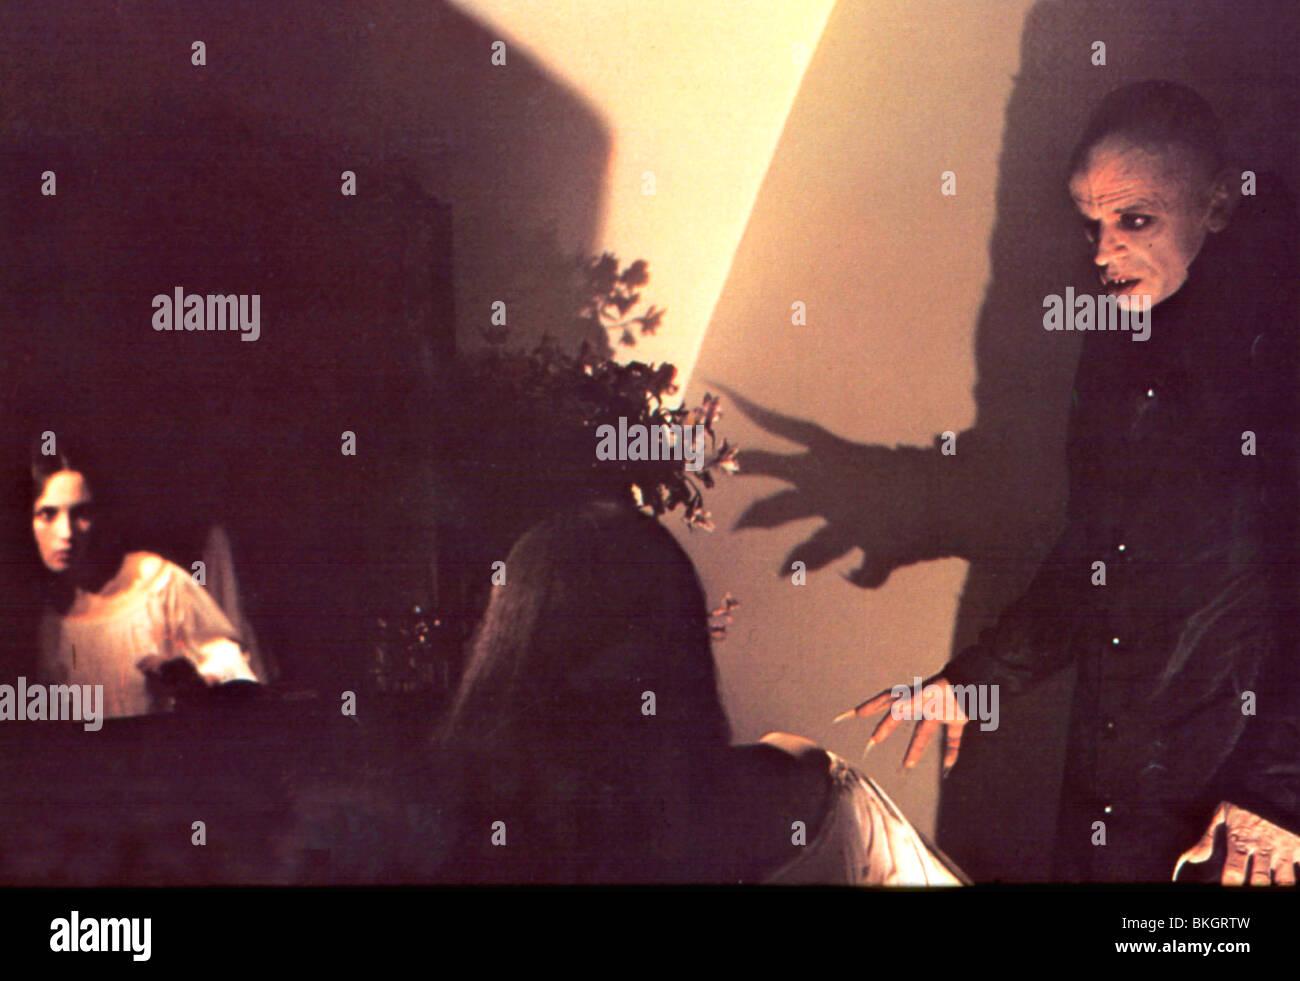 NOSFERATU THE VAMPYRE (1979) ISABELLE ADJANI, KLAUS KINSKI NSF 019 Stock Photo